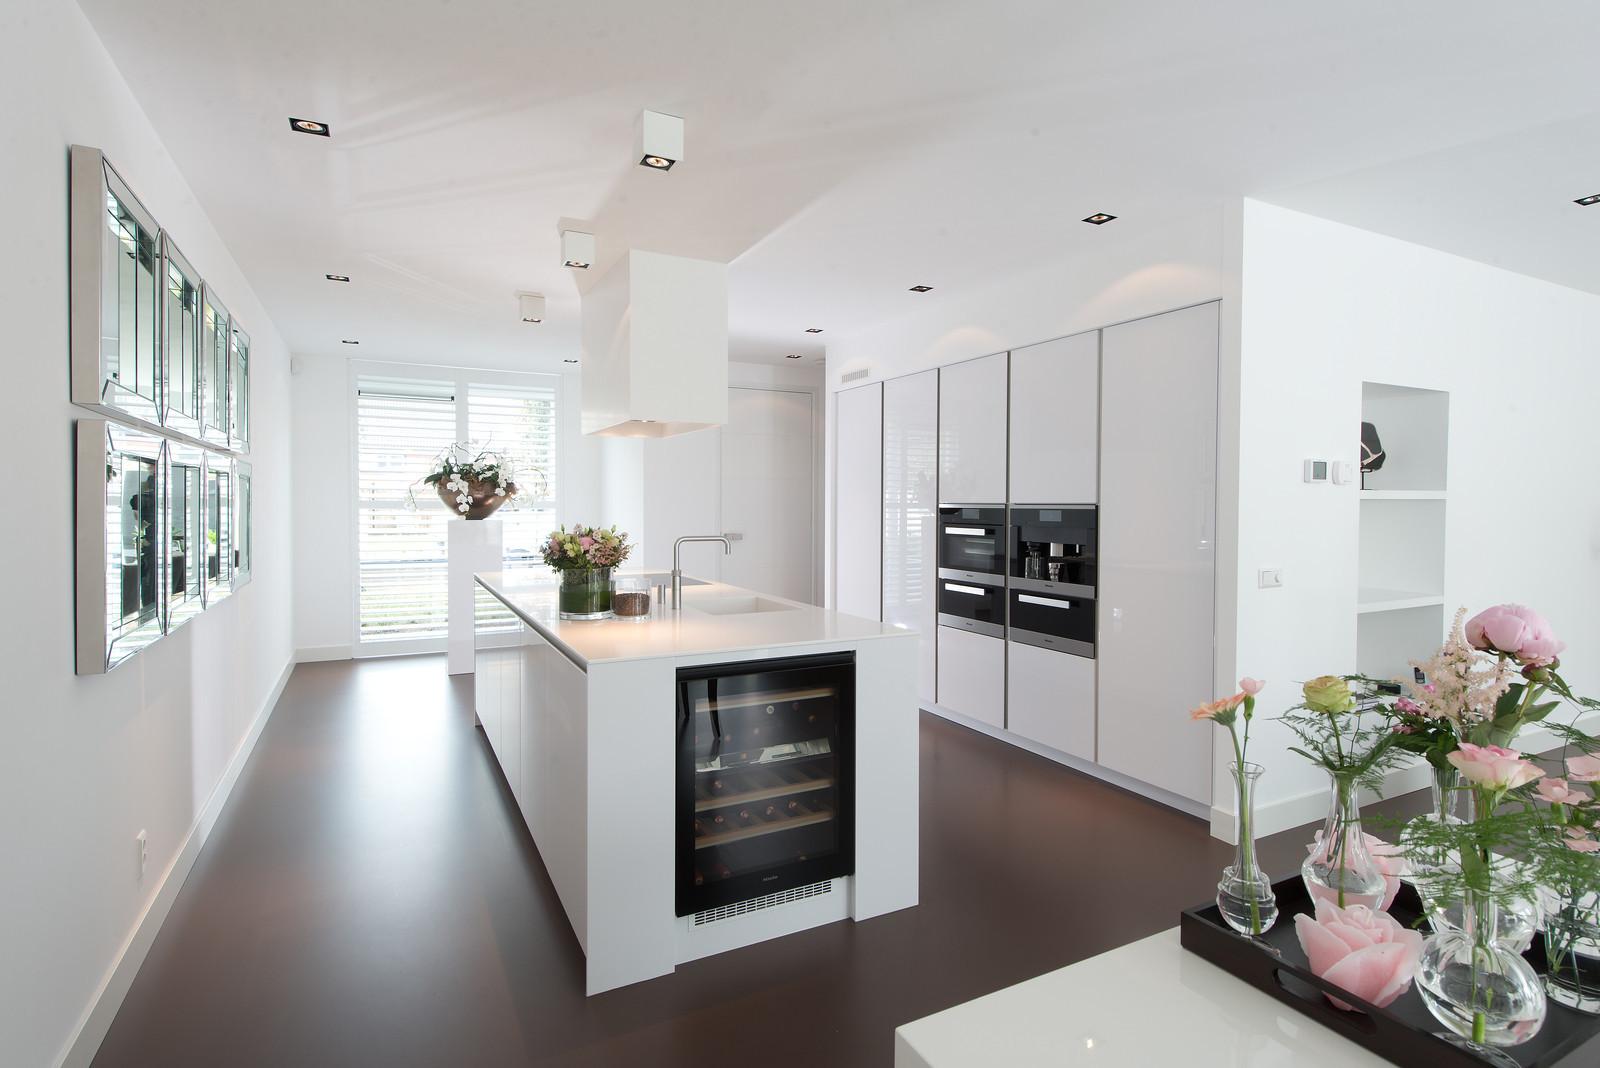 Mooie Witte Moderne Design Keuken Met Keukeneiland : ... design keuken ...